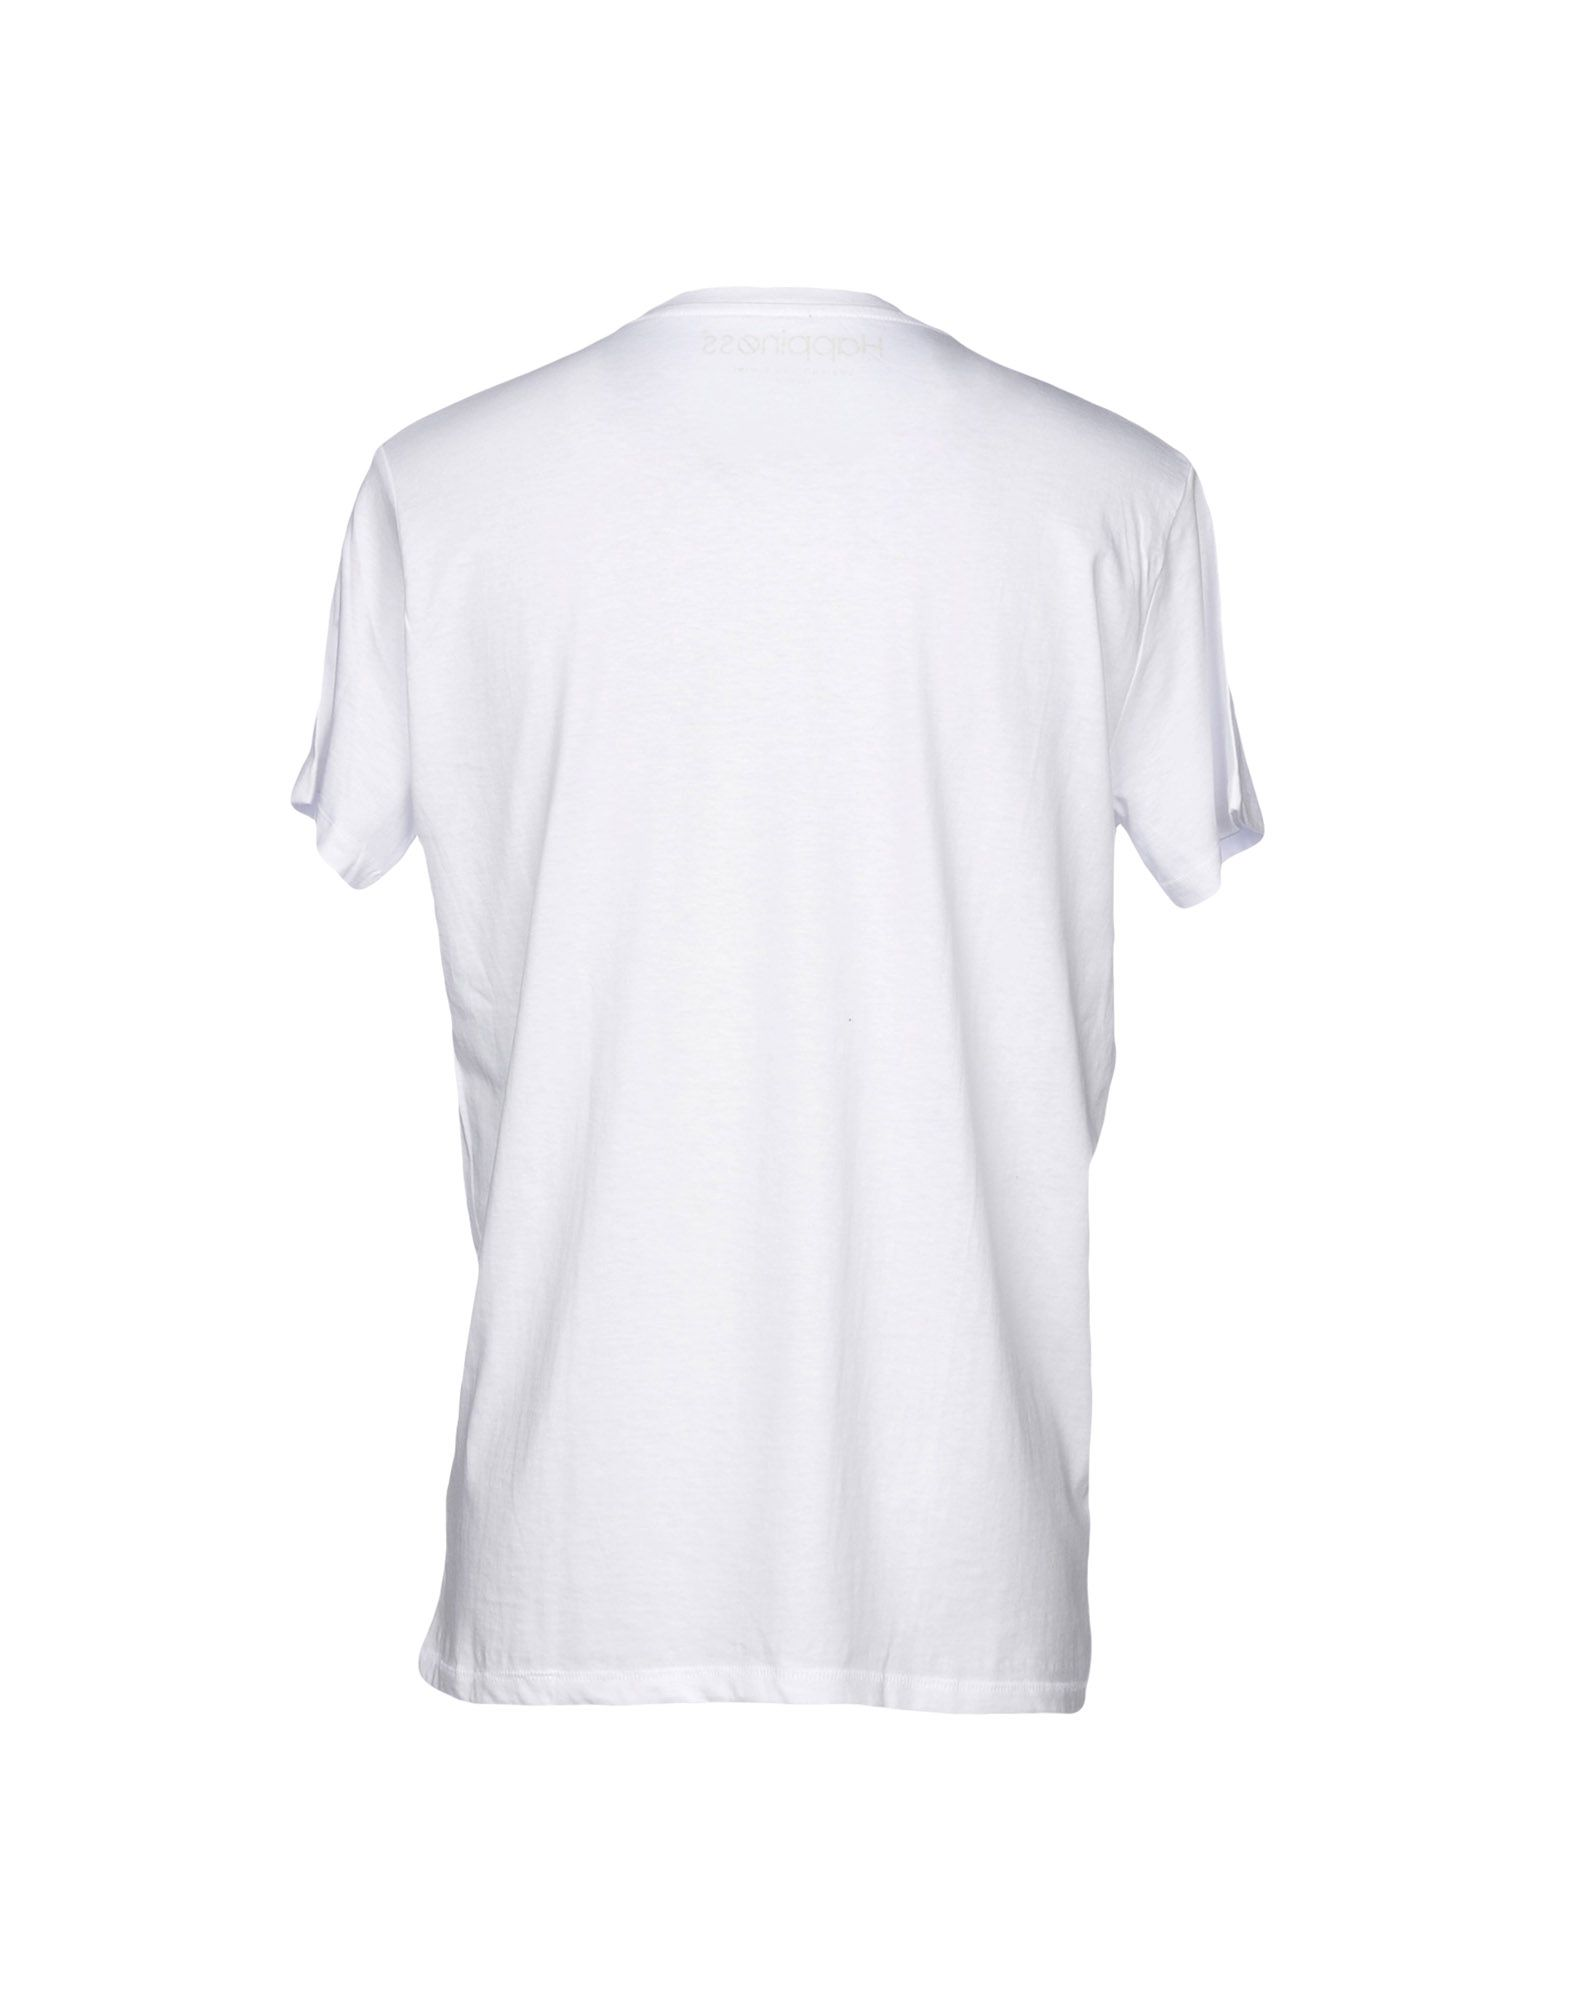 A buon mercato A buon mercato T-Shirt Happiness Uomo - - Uomo 12185201WR 2db223